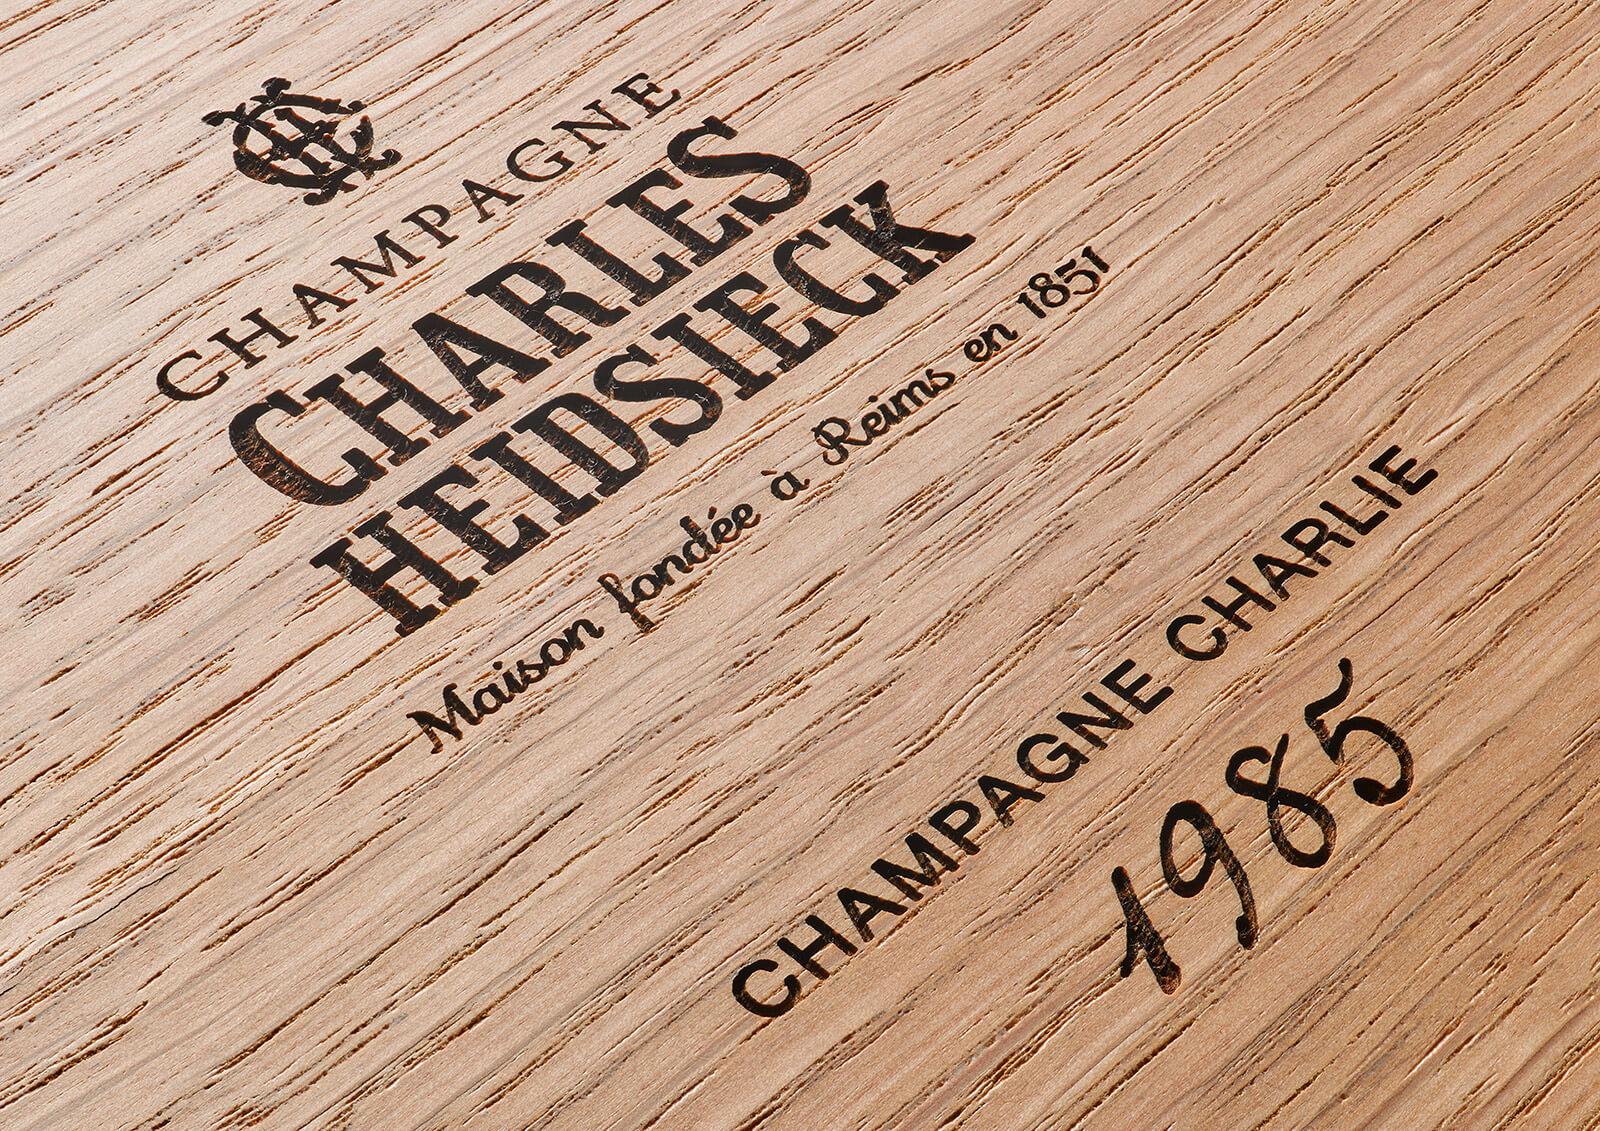 Case Charles Heidsieck Champagne Charlie 1985